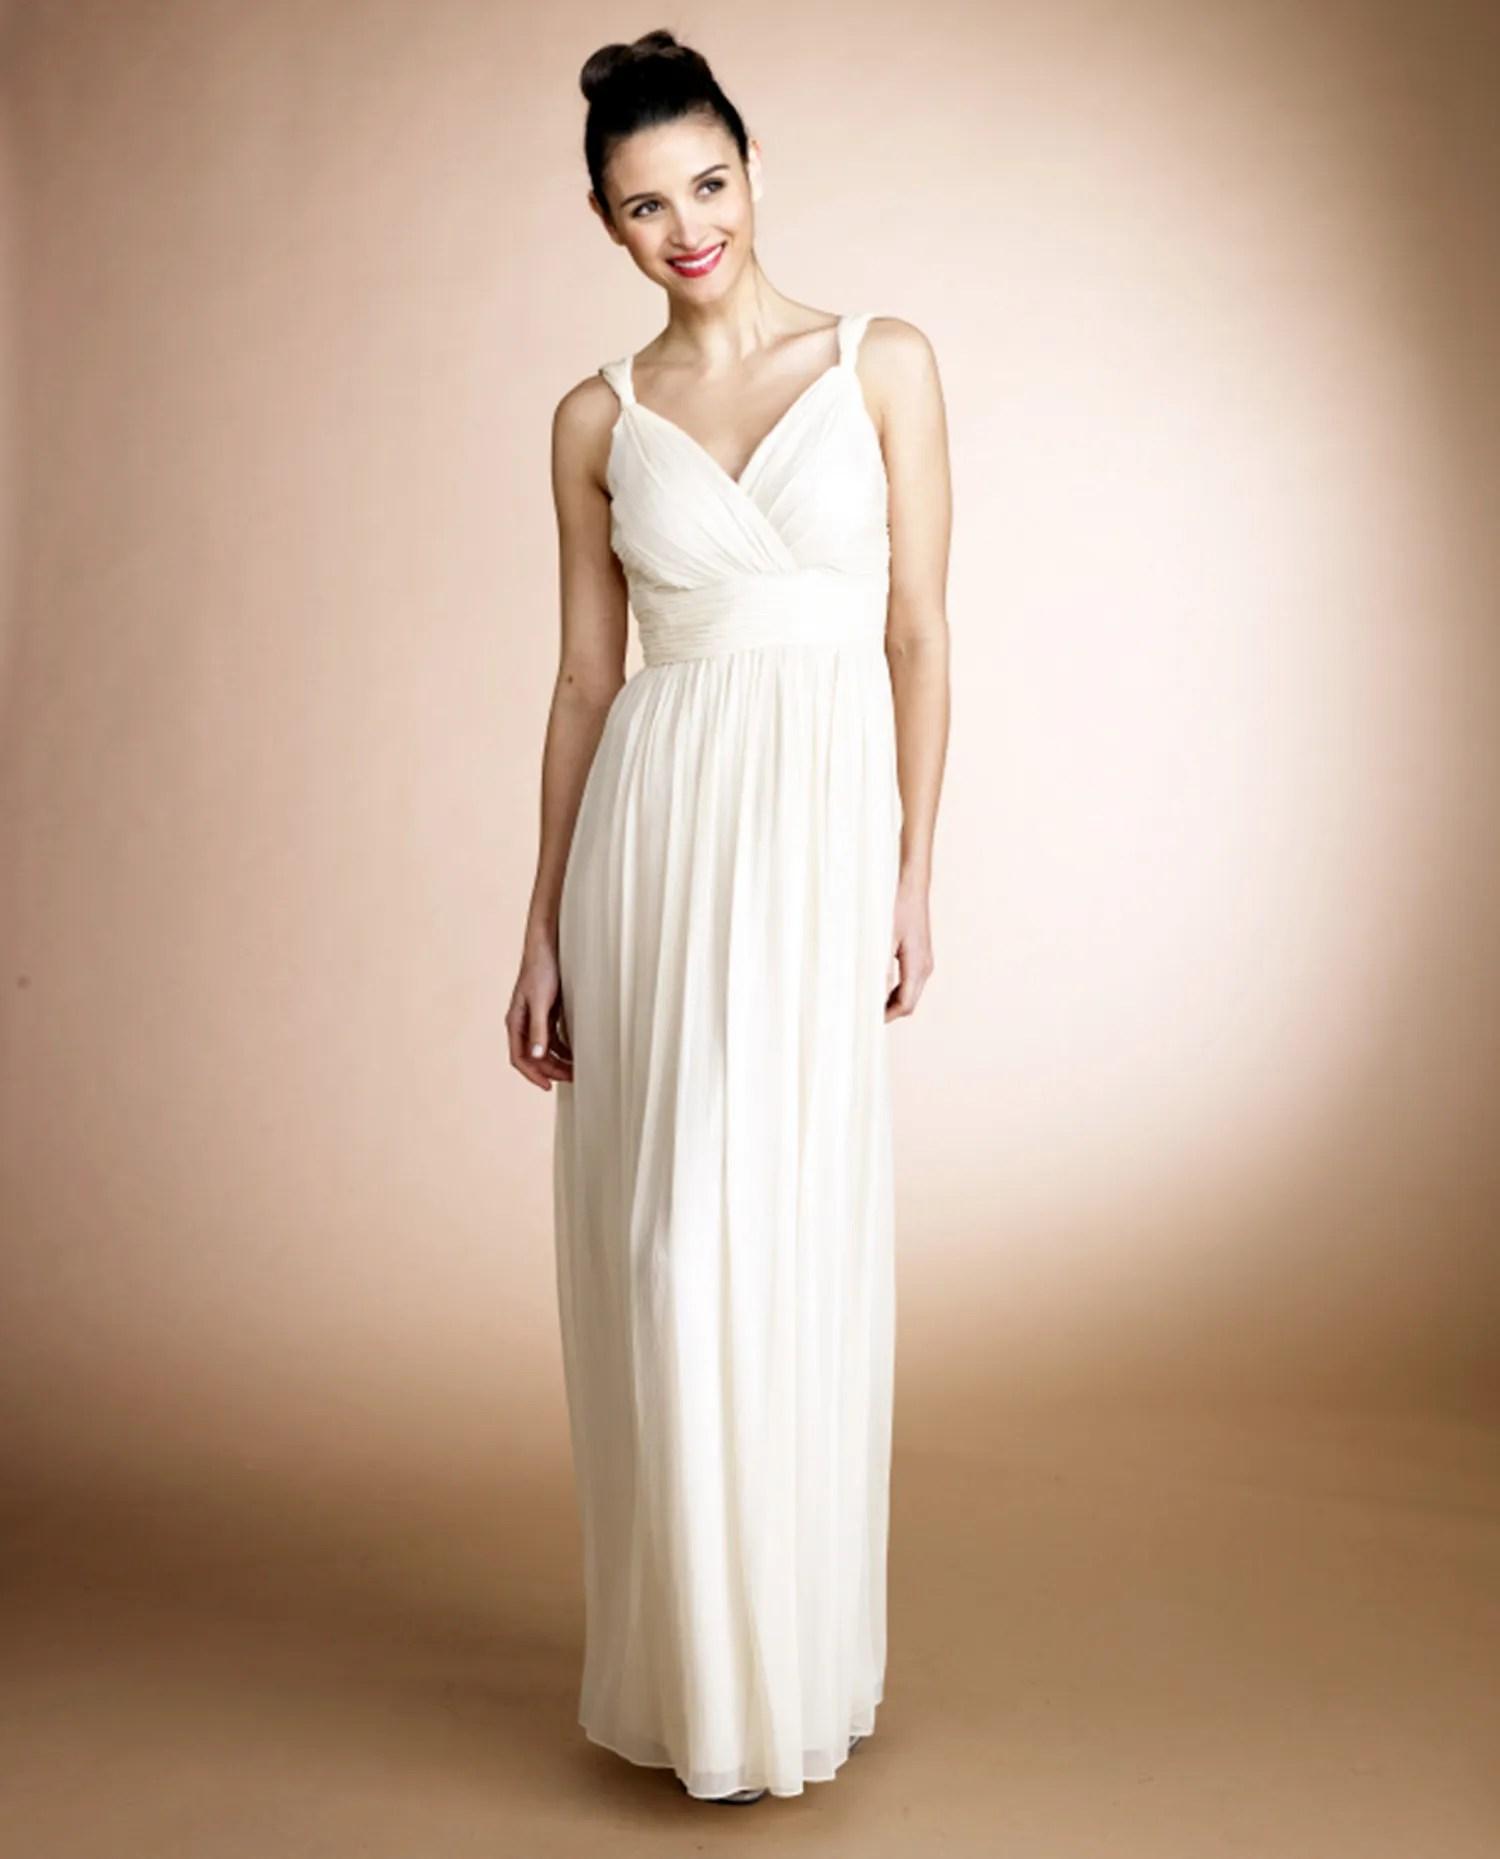 Beach Wedding Dresses Under 100 Dollars